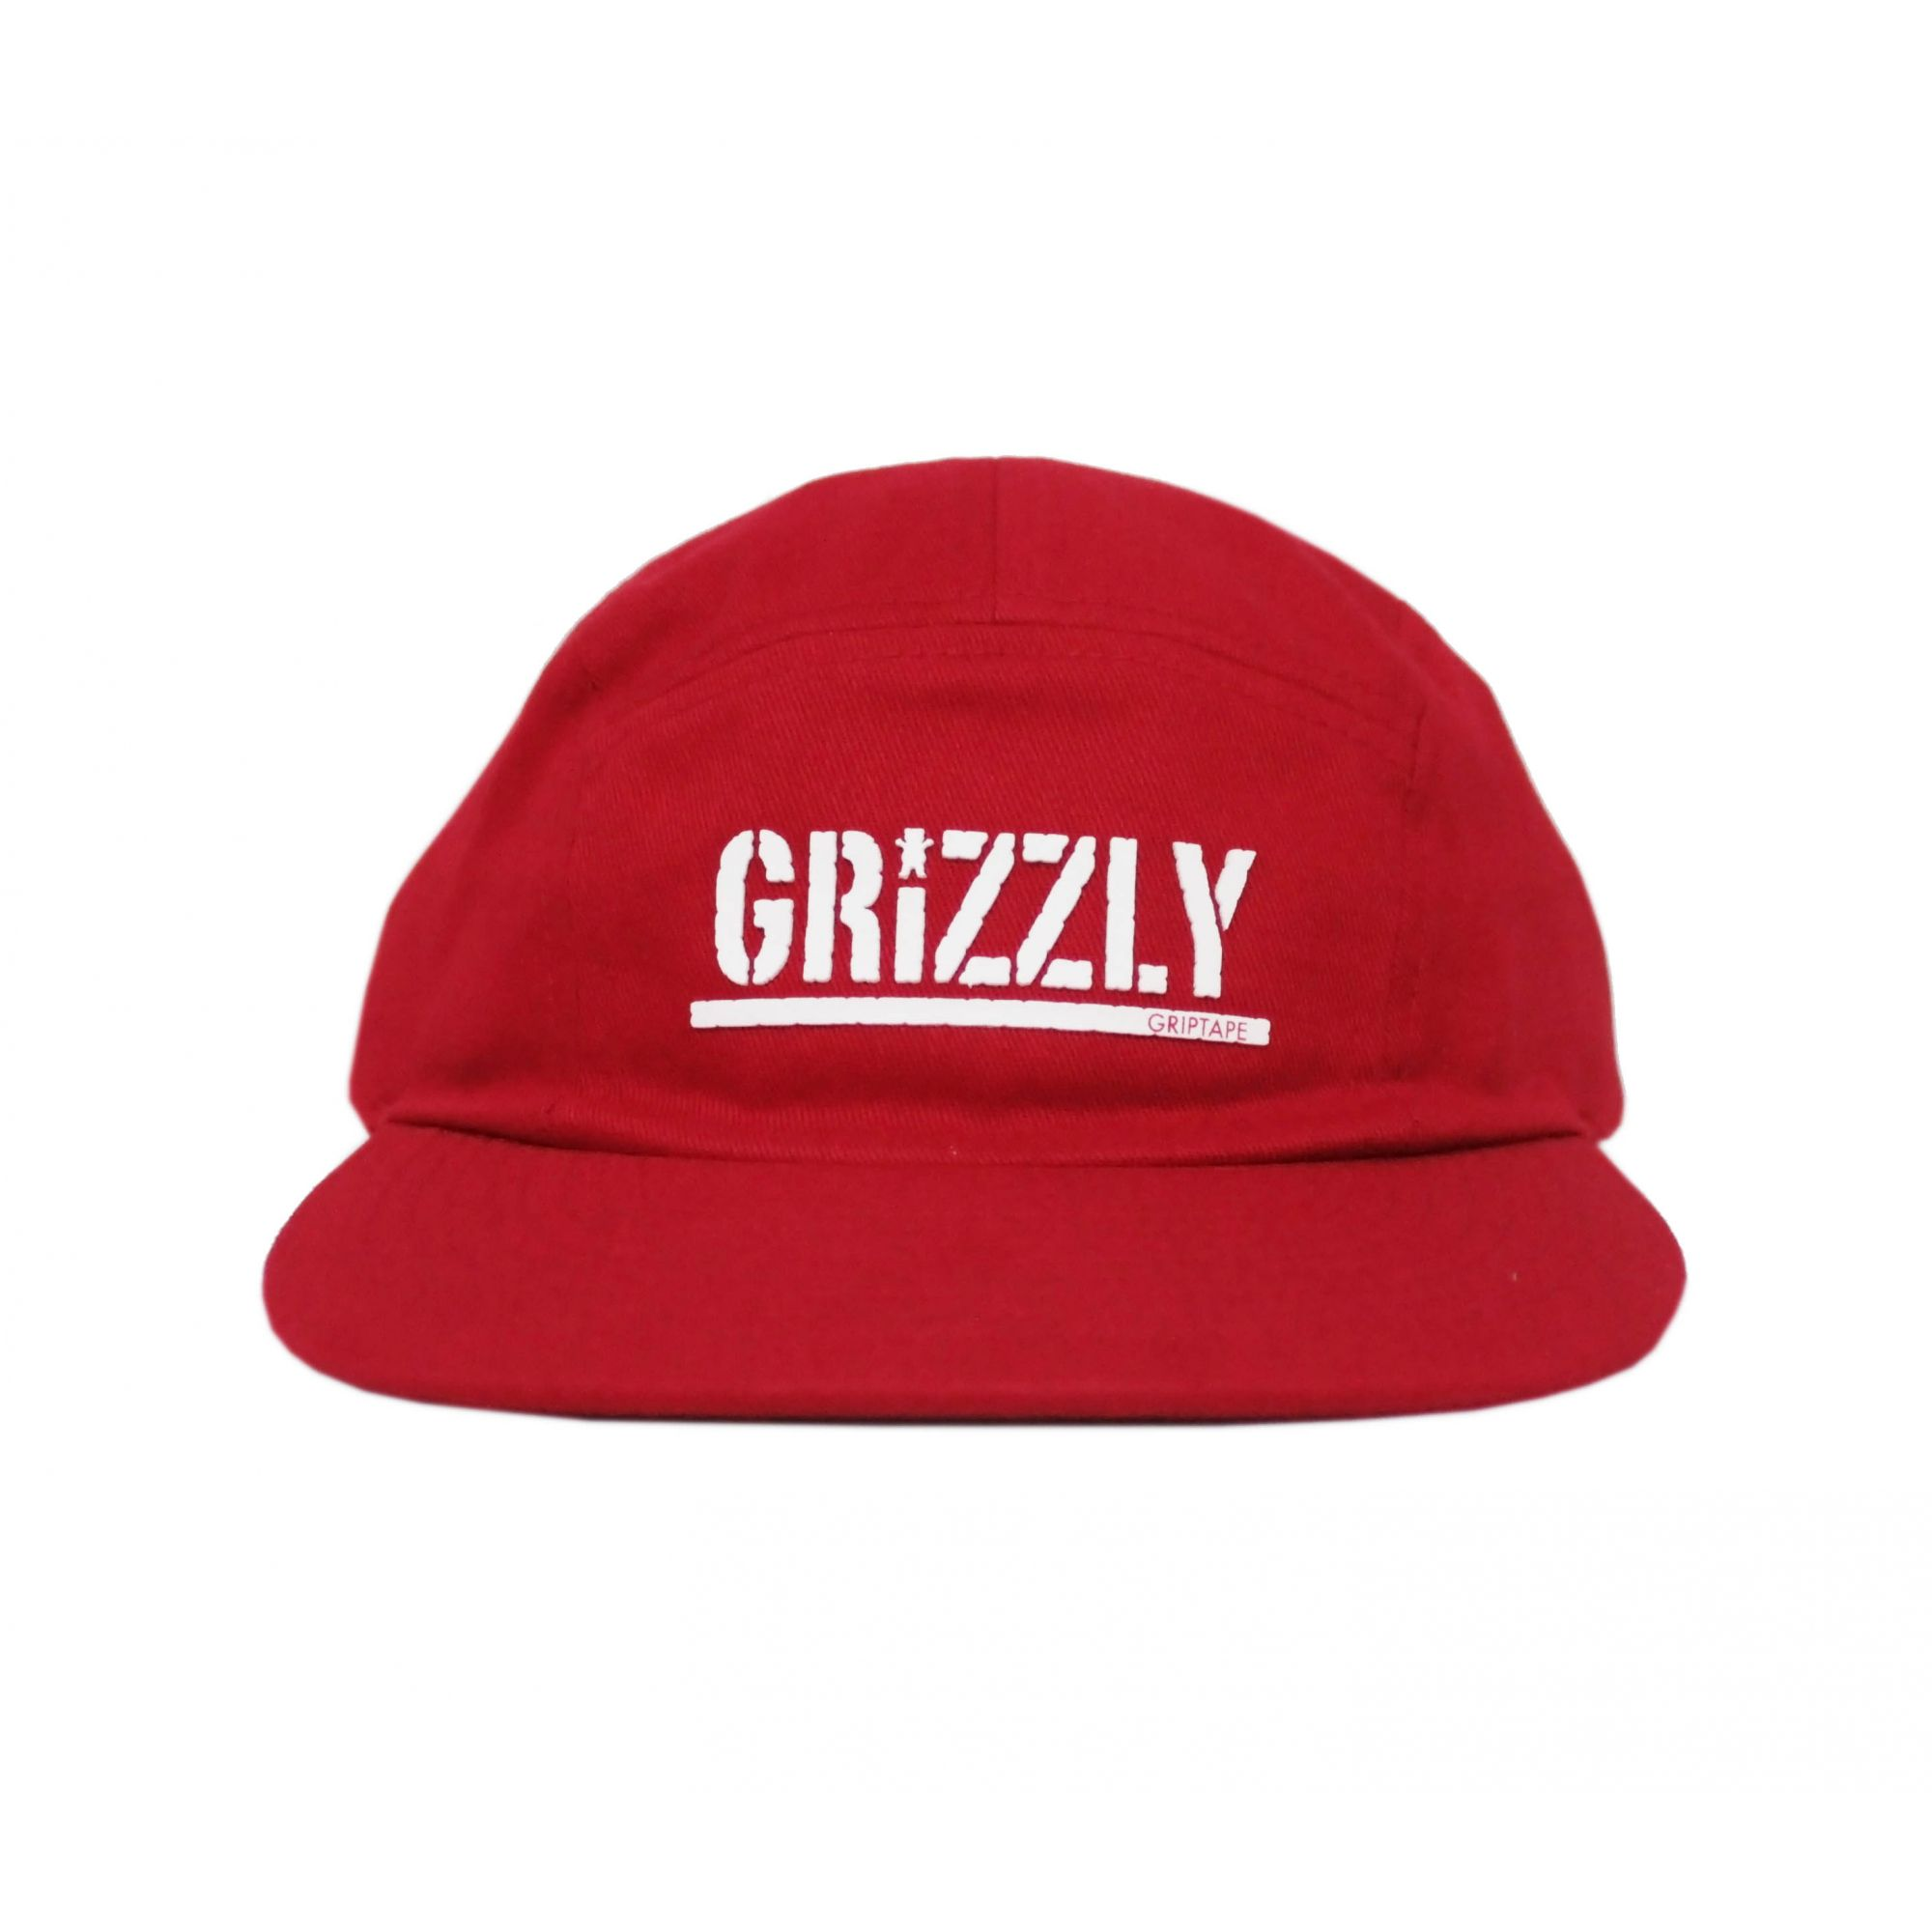 Boné Grizzly Five Panel Stamped Camper Unstructer Clip - Vermelho